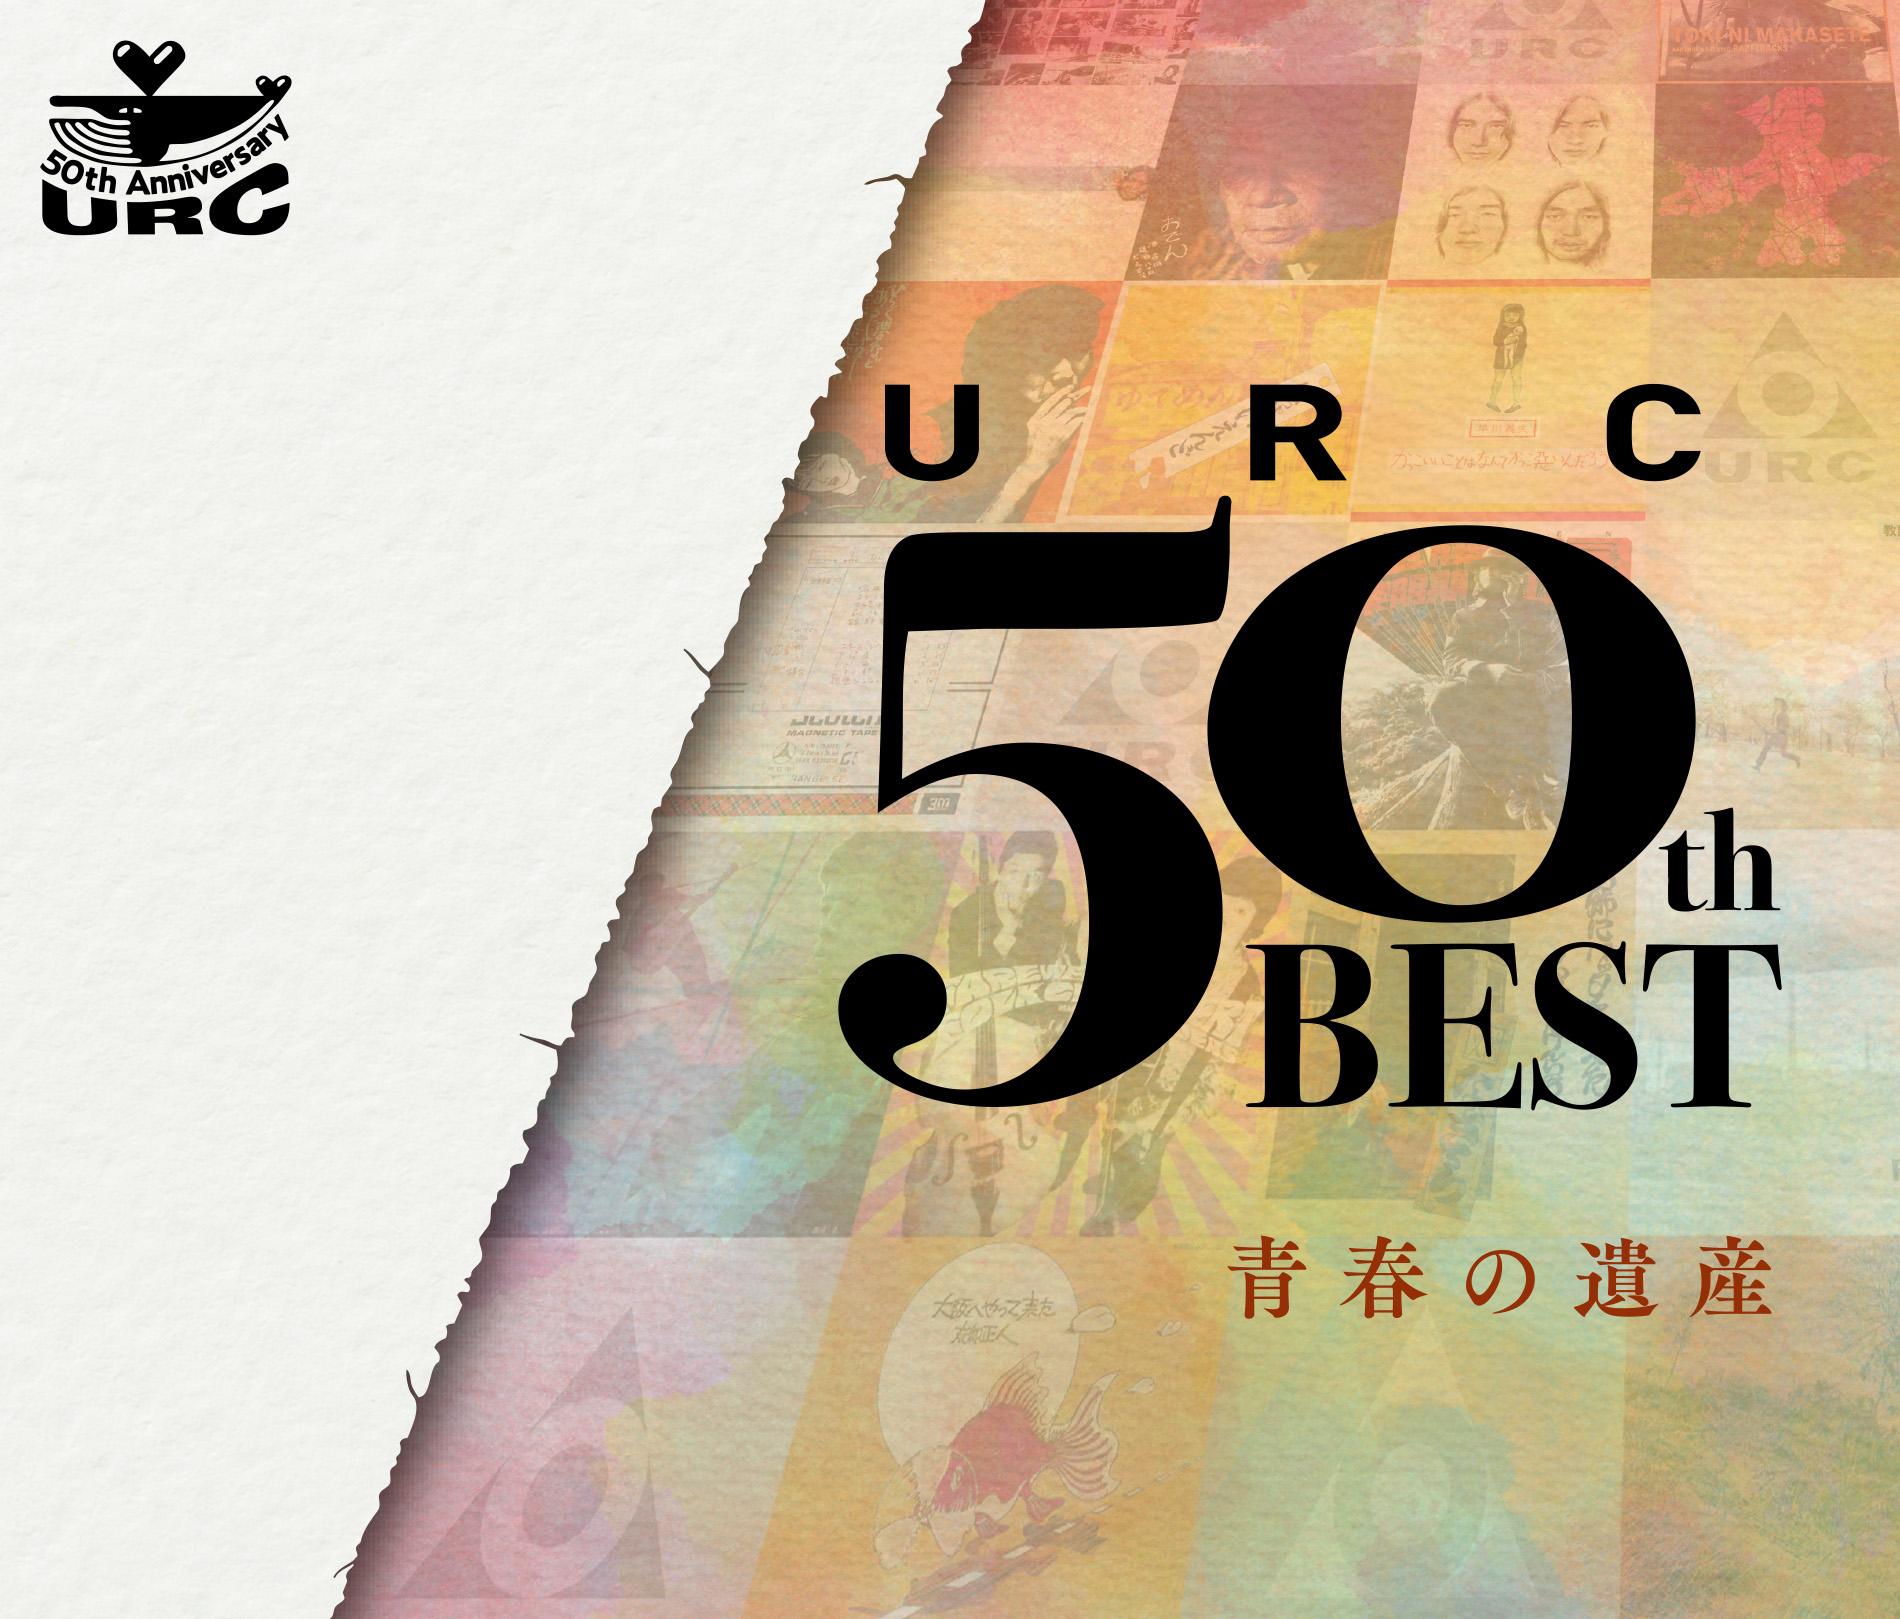 URC 50th BEST Seishun No Isan No.1